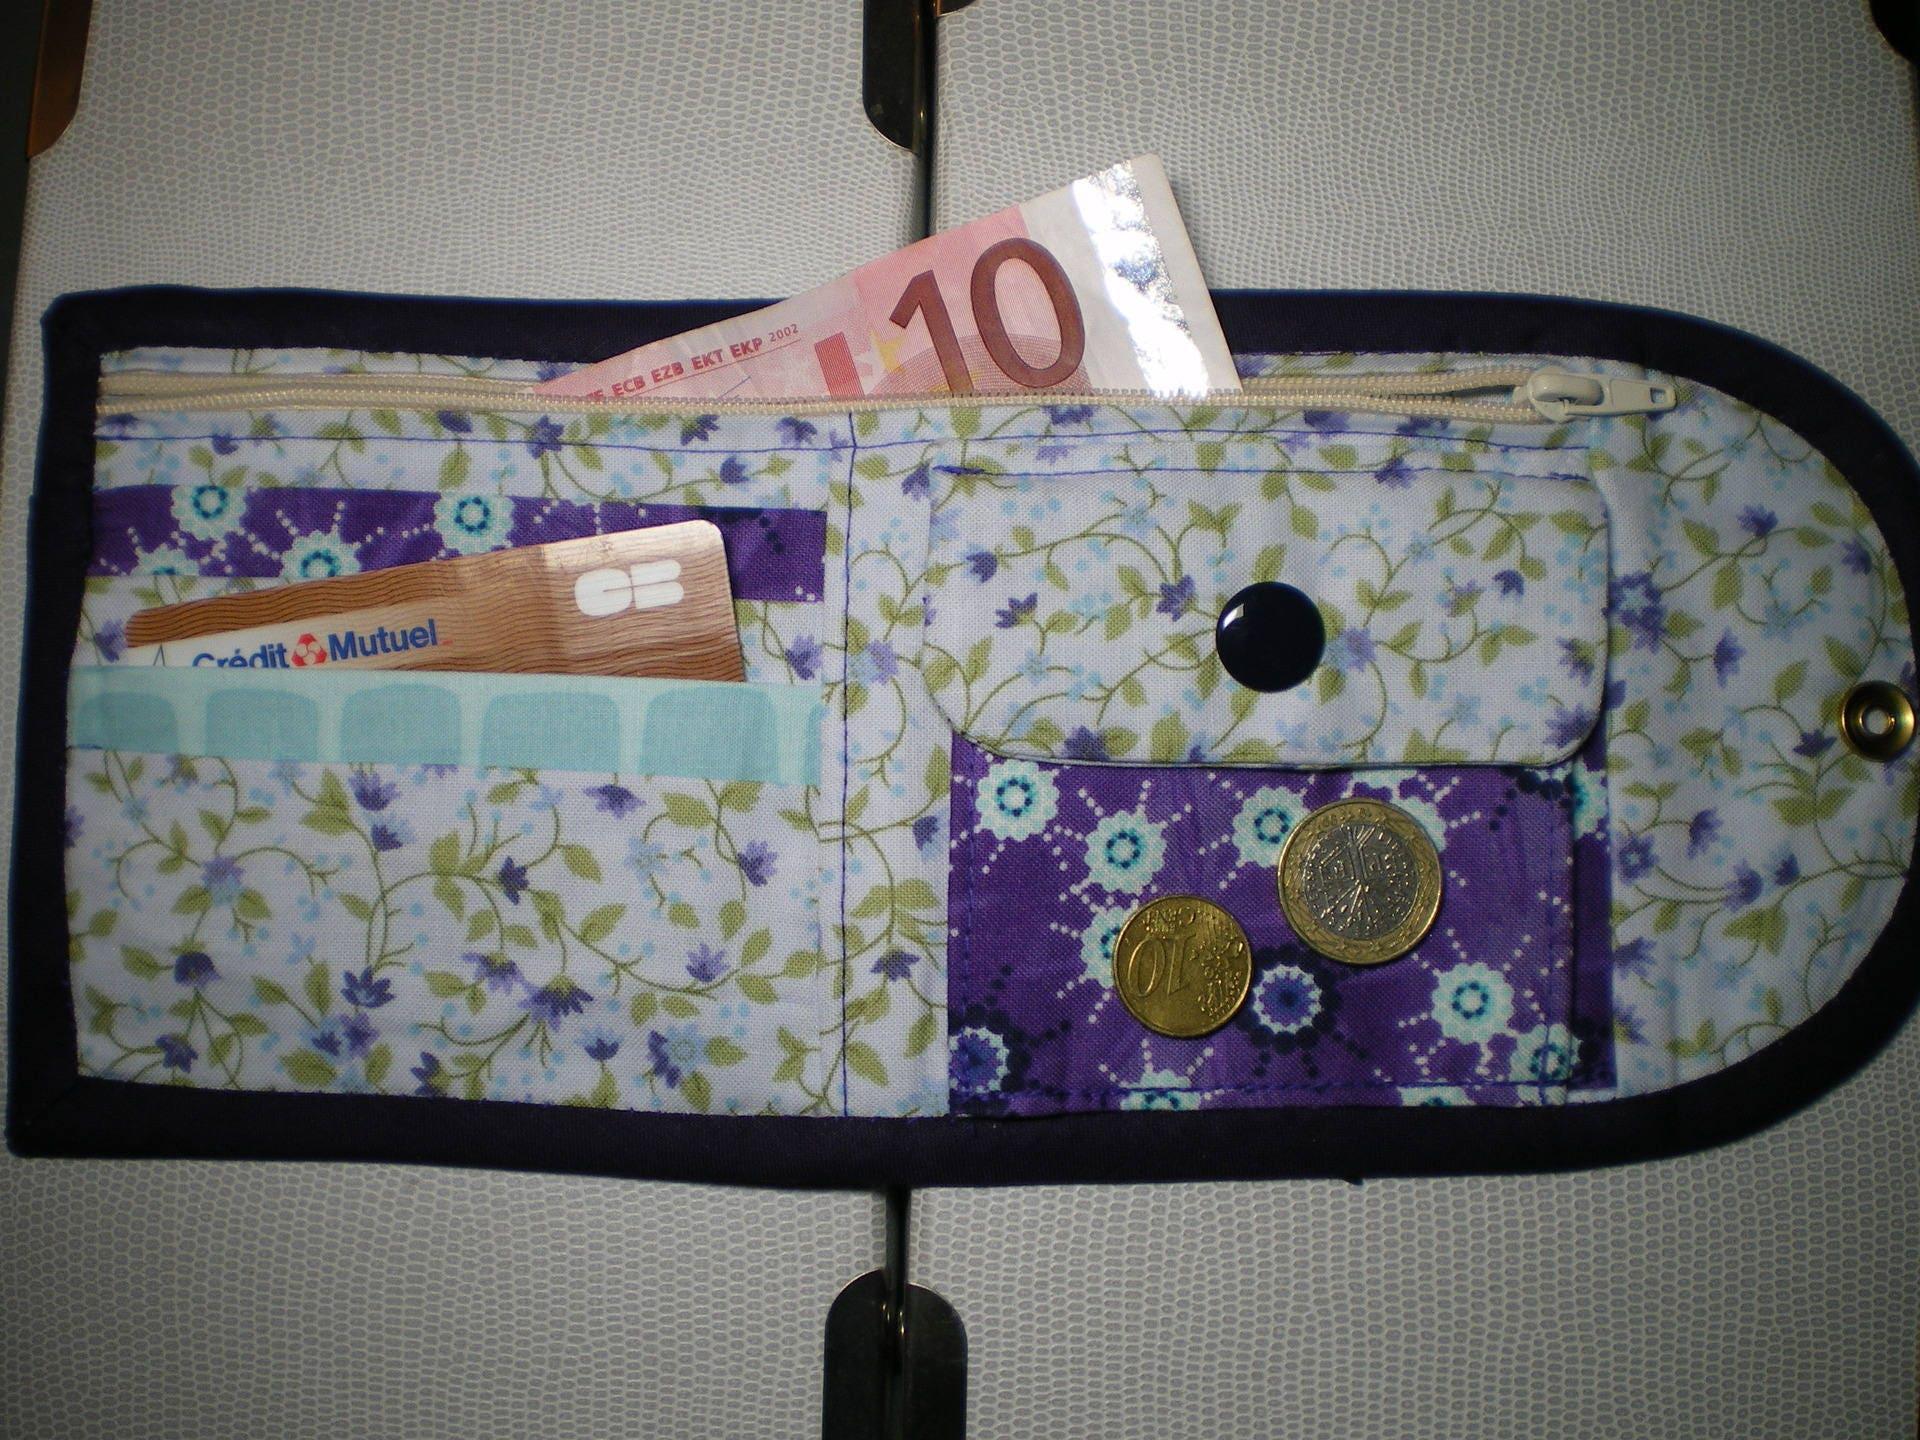 Porte monnaie porte cartes en tissu patchwork fleuri violet etsy - Porte monnaie en tissu ...